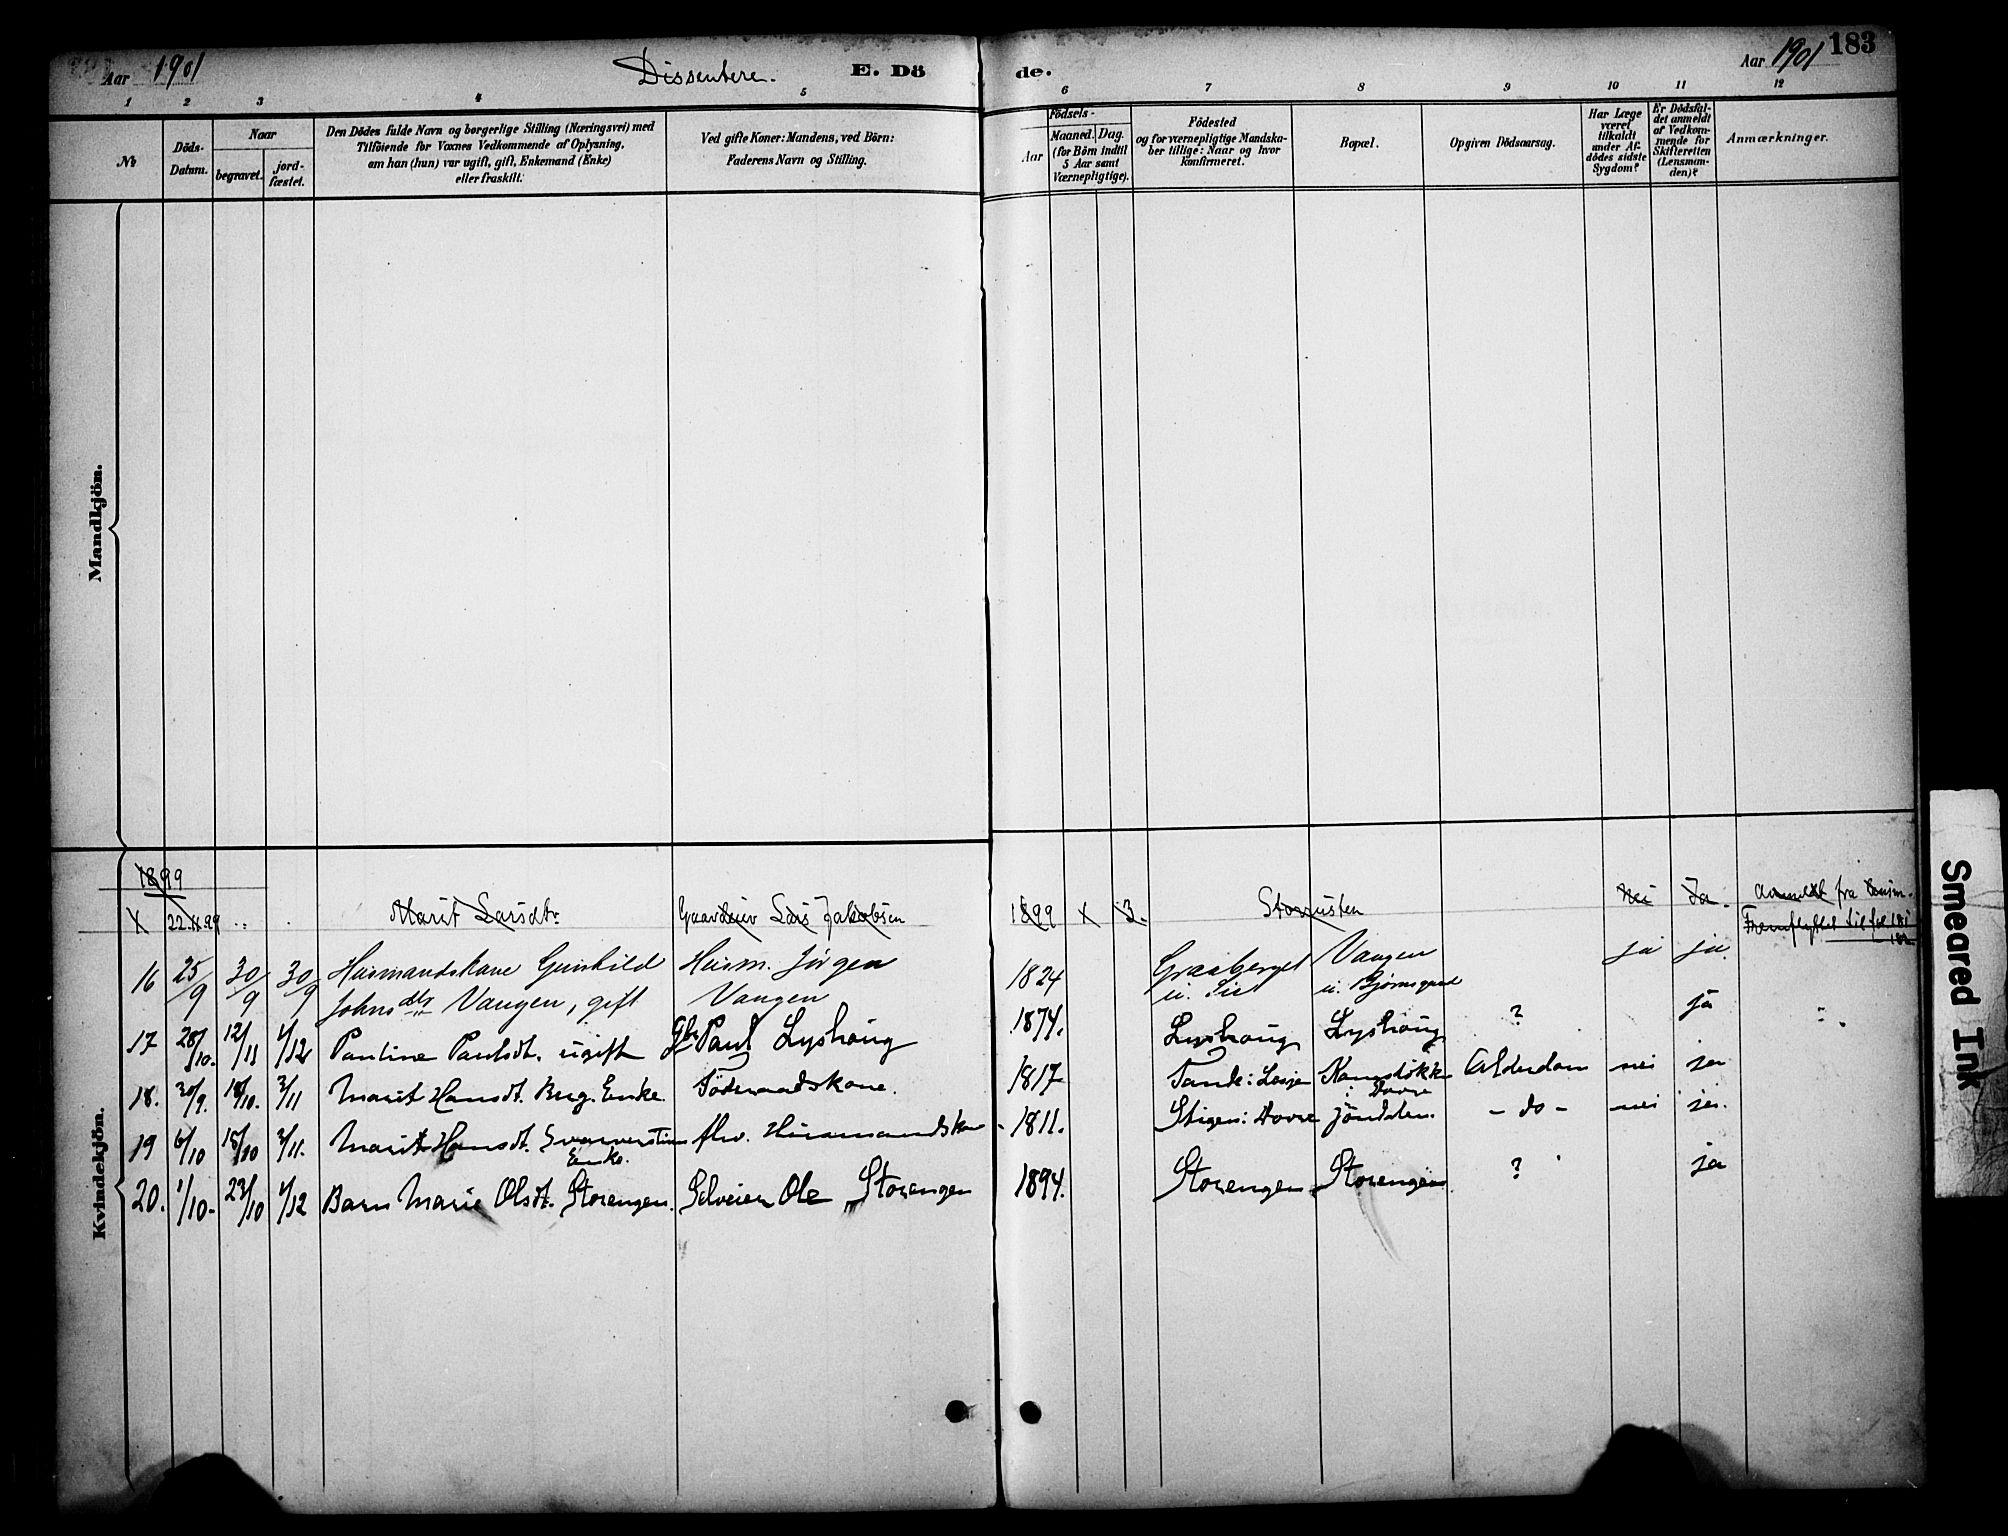 SAH, Dovre prestekontor, Ministerialbok nr. 3, 1891-1901, s. 183